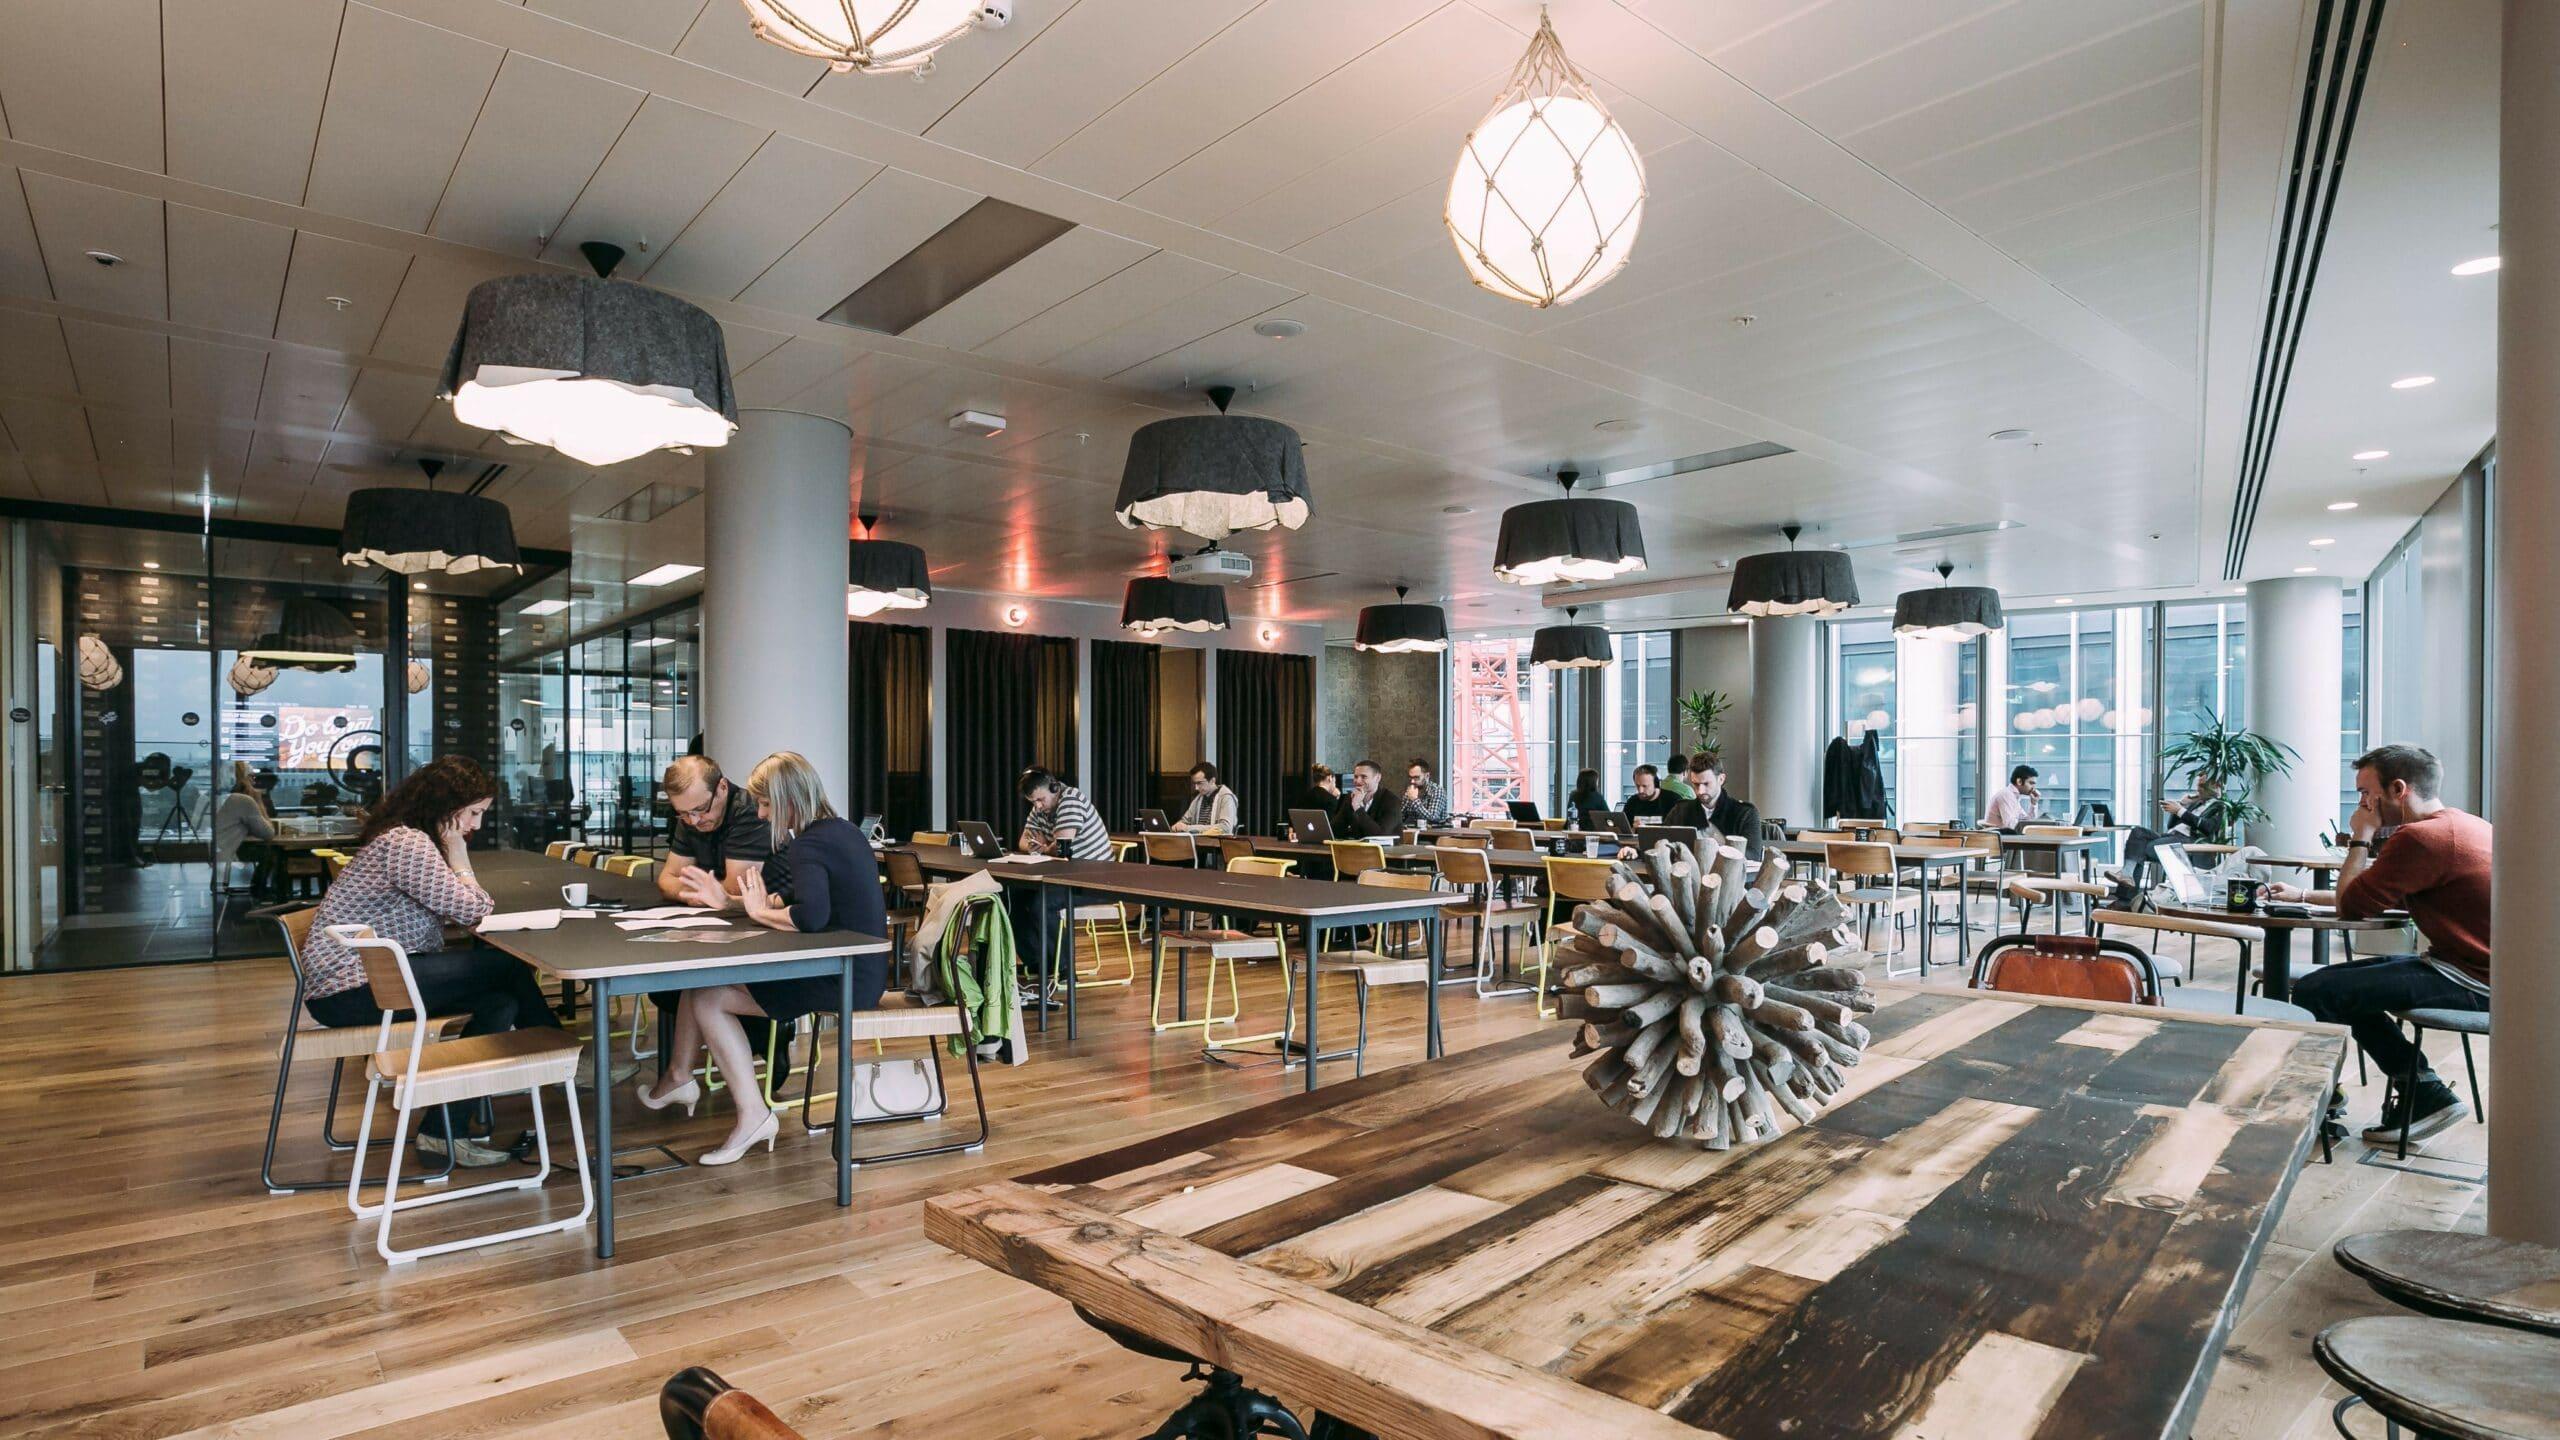 Coworking Spaces Break Up The Monotony of Work